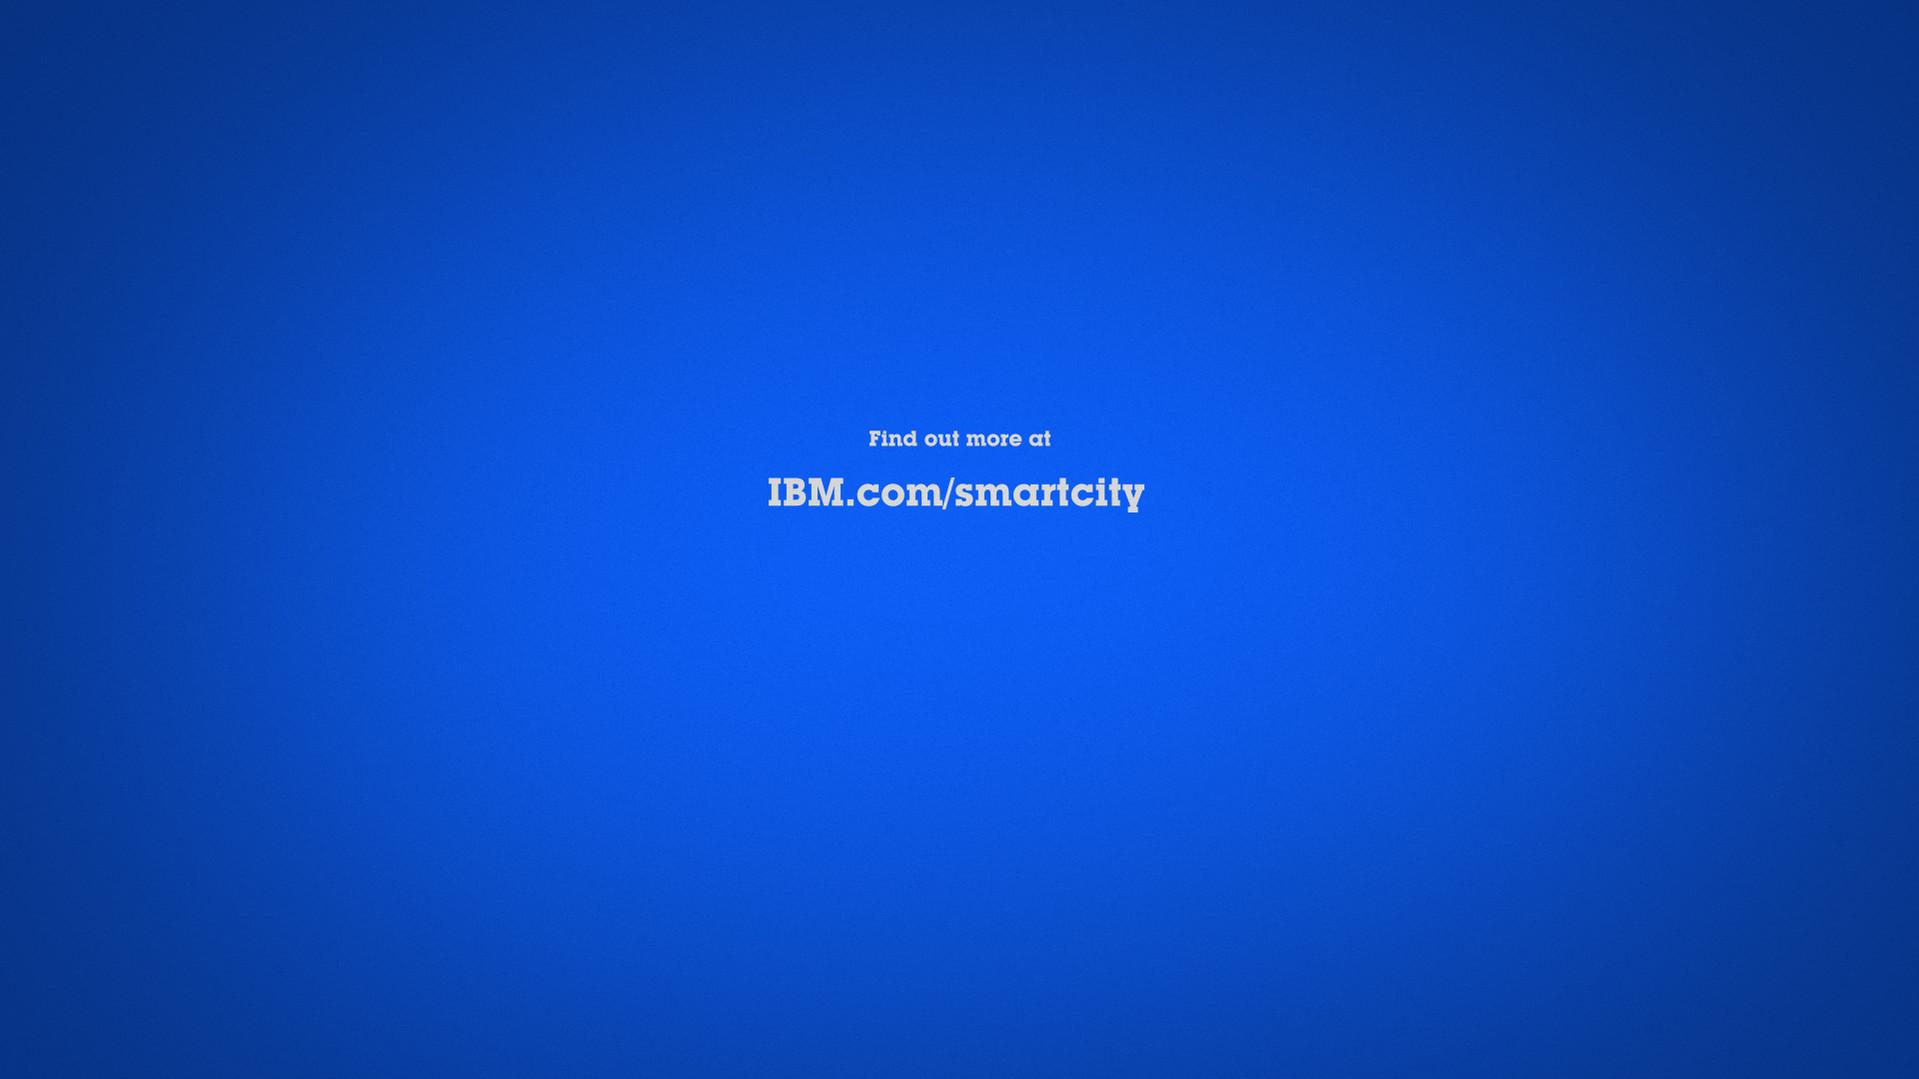 IBM - Smart City [ Student Project ] - Board 13